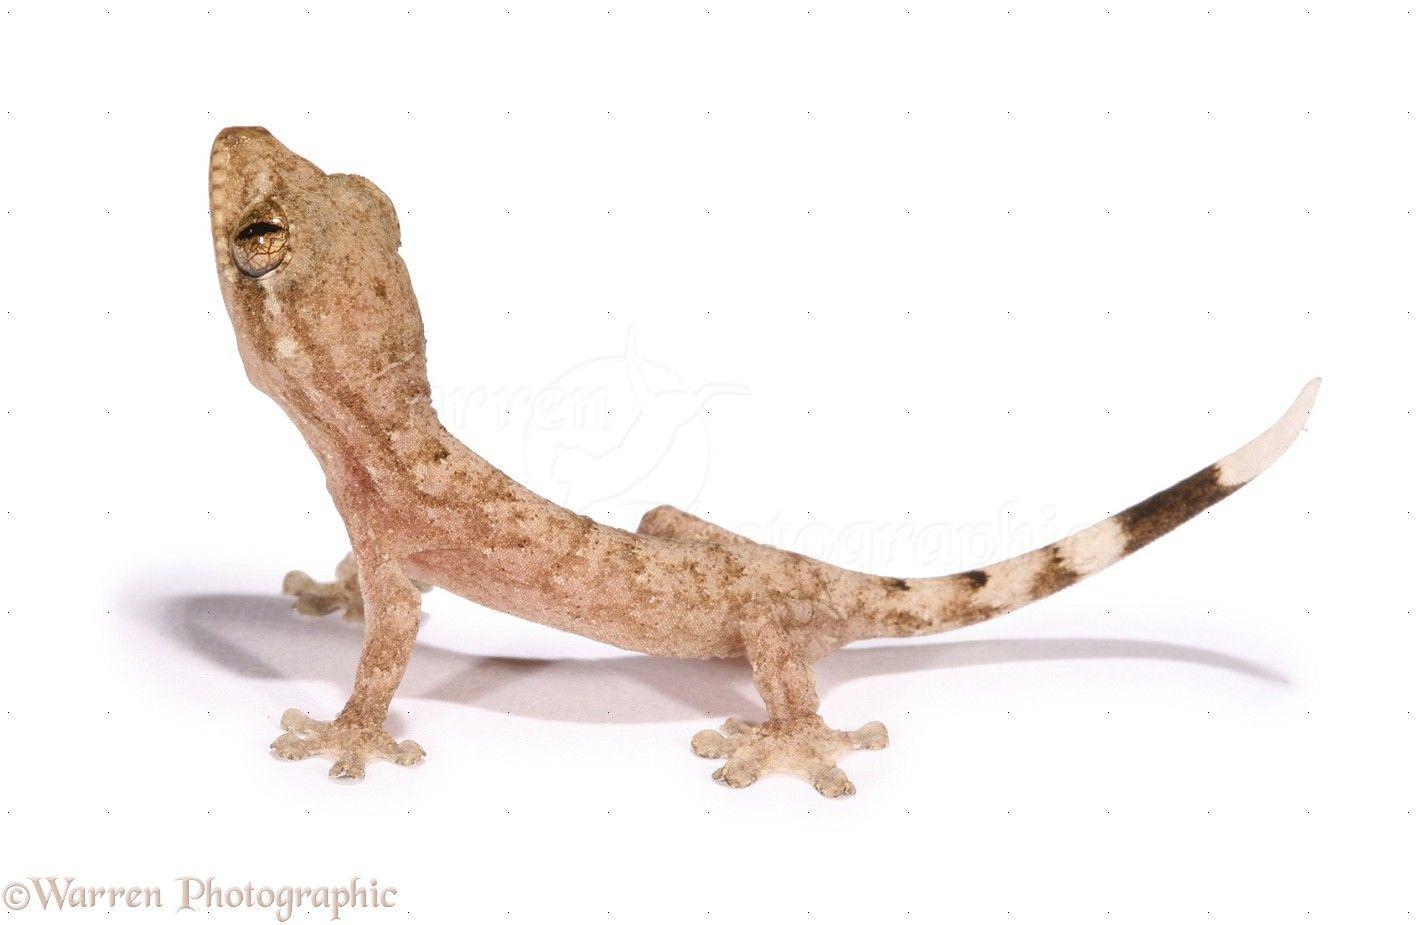 Baby Gecko Photo Wp12801 Gecko White Background Images